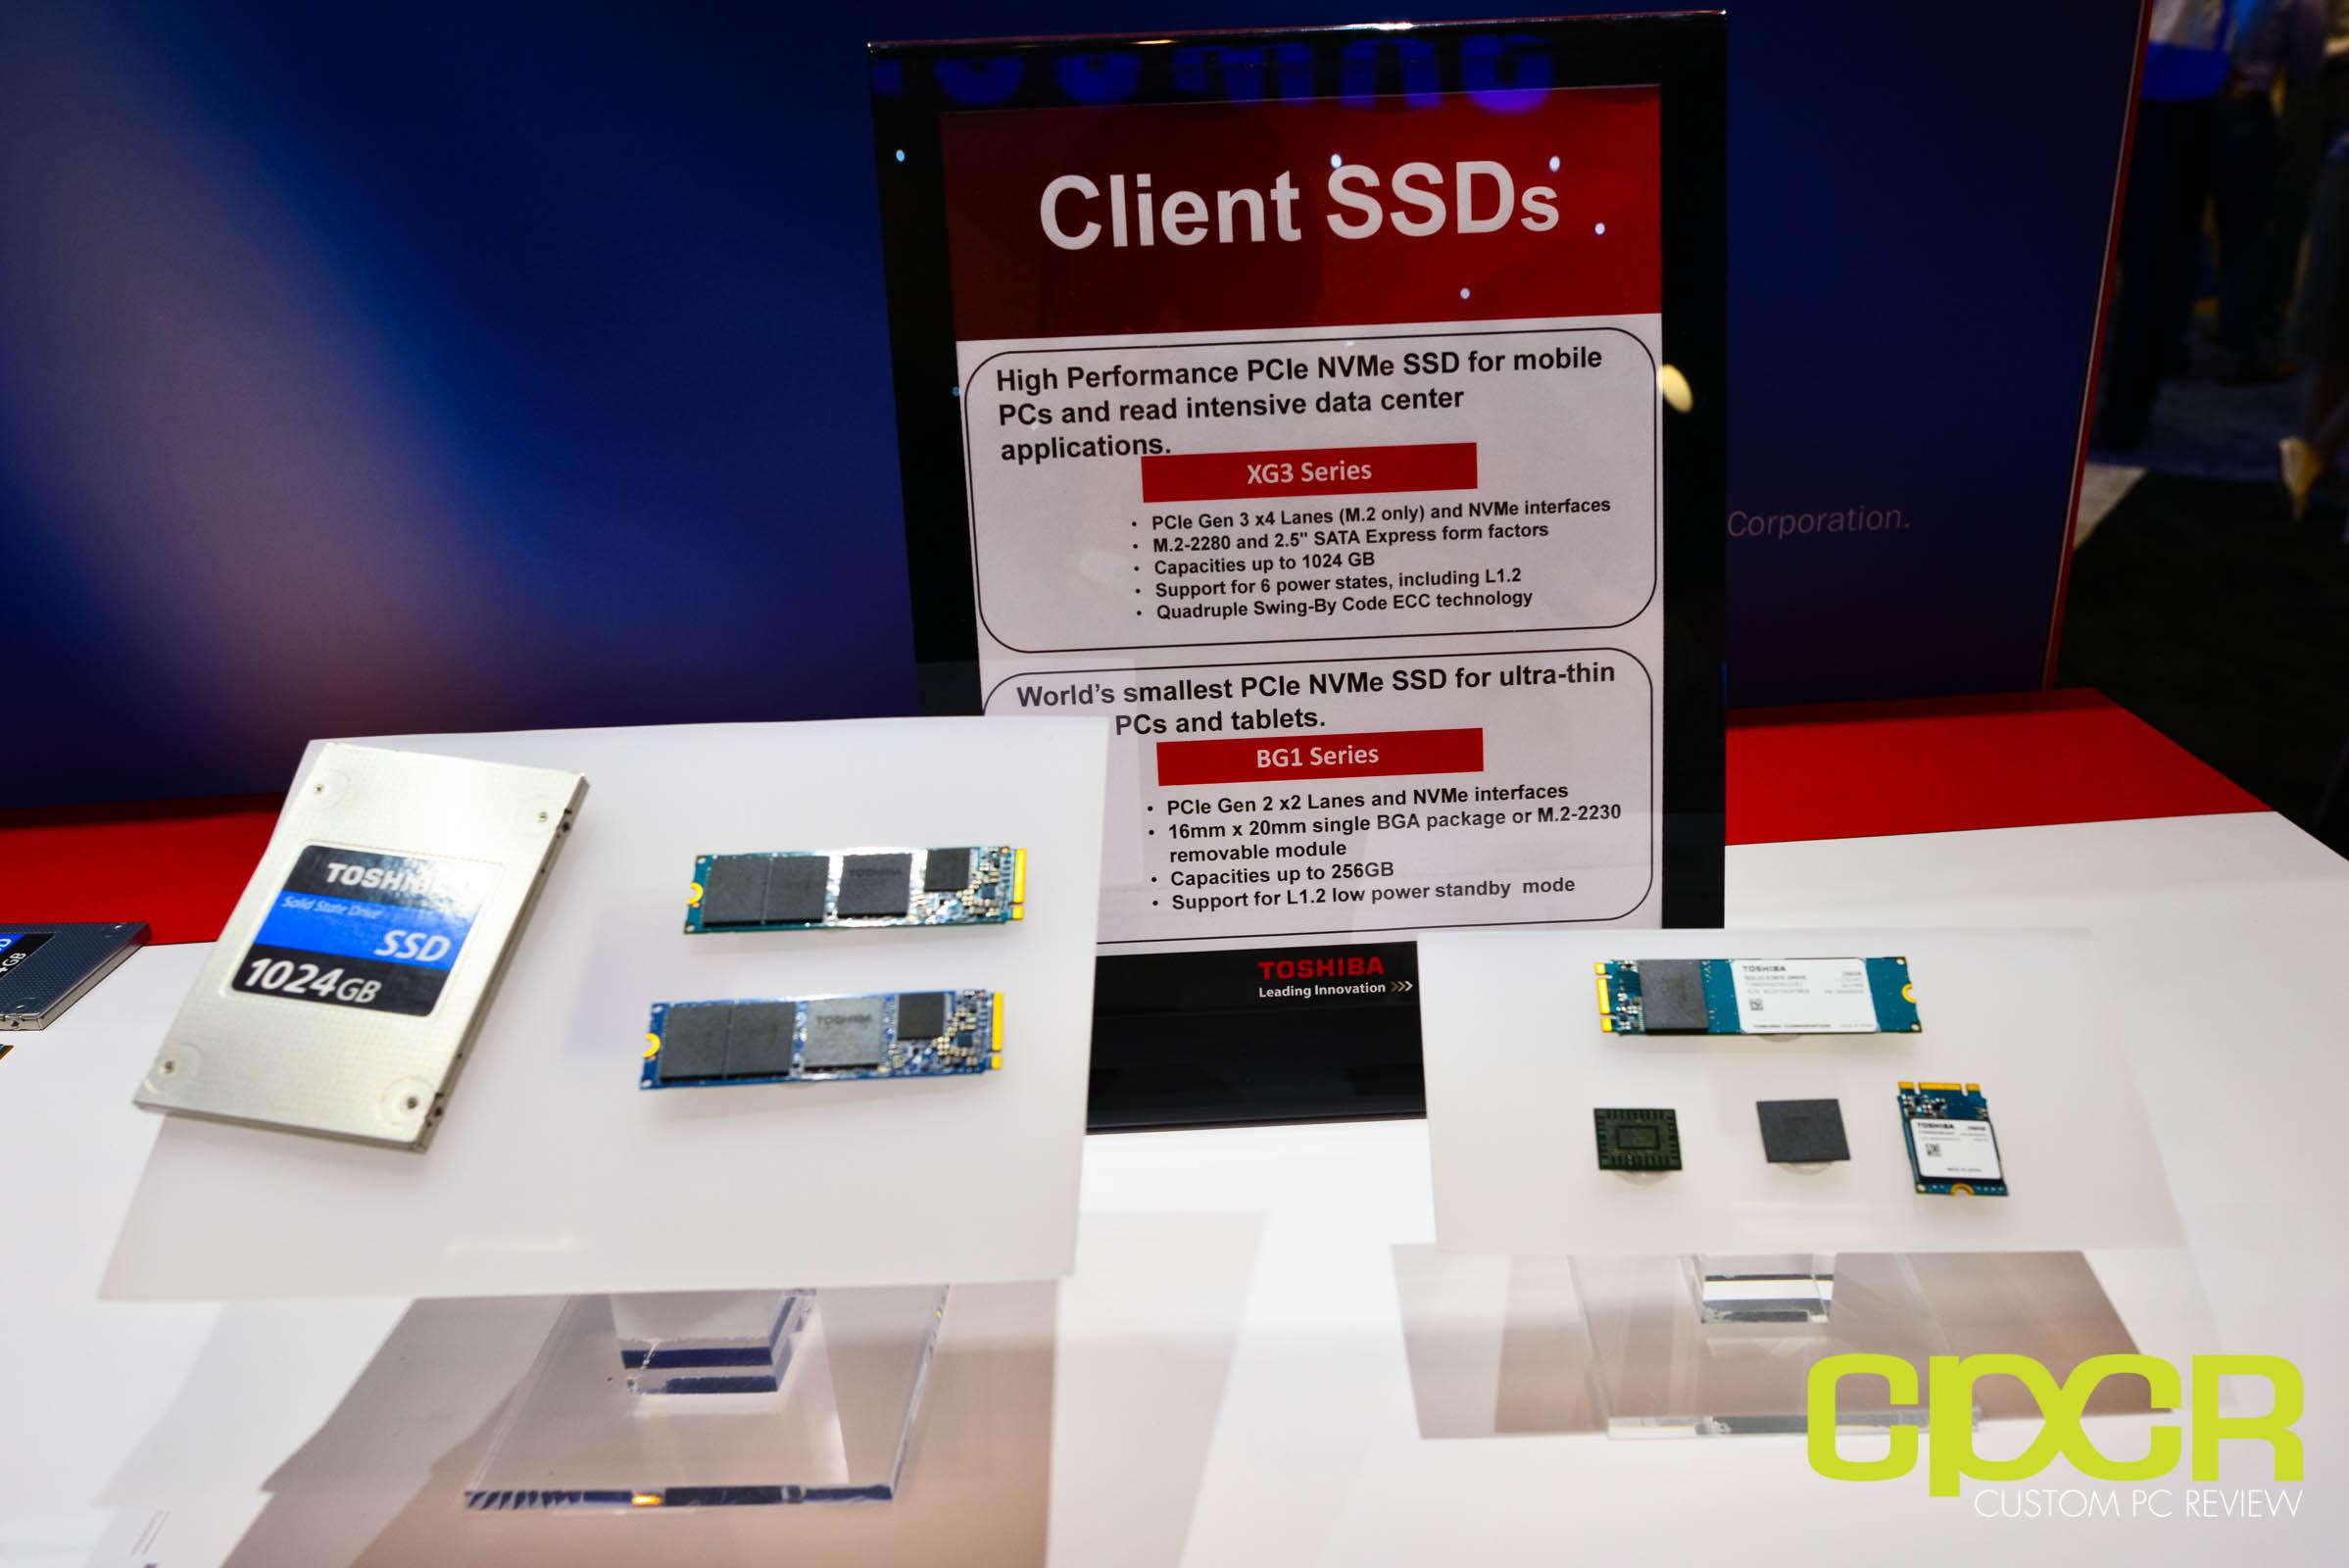 Fms 2015 Toshiba Announces Xg3 Bg1 Px04p Nvme Ssds